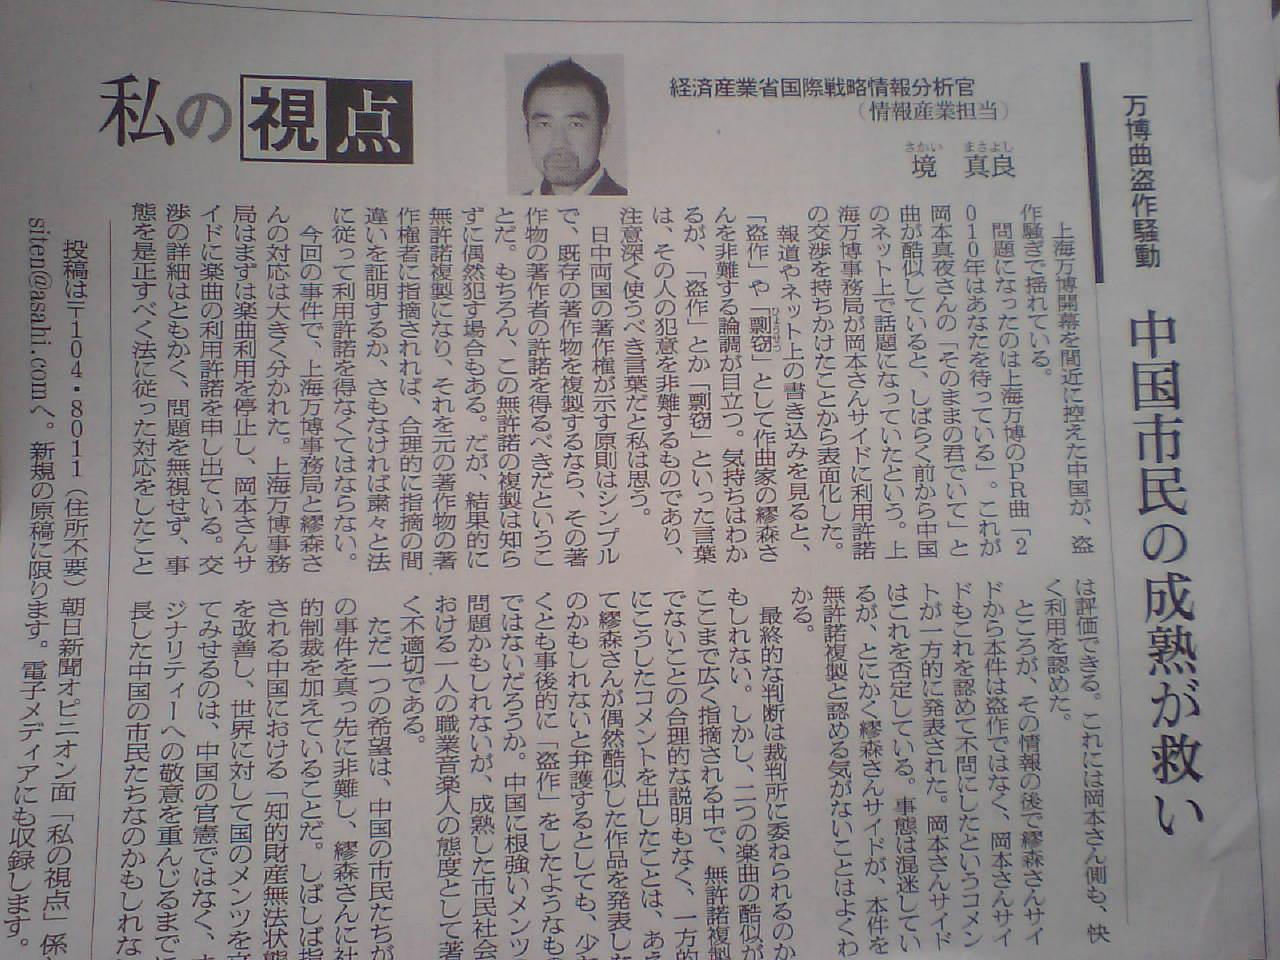 朝日新聞27日の朝刊_d0027795_10565040.jpg